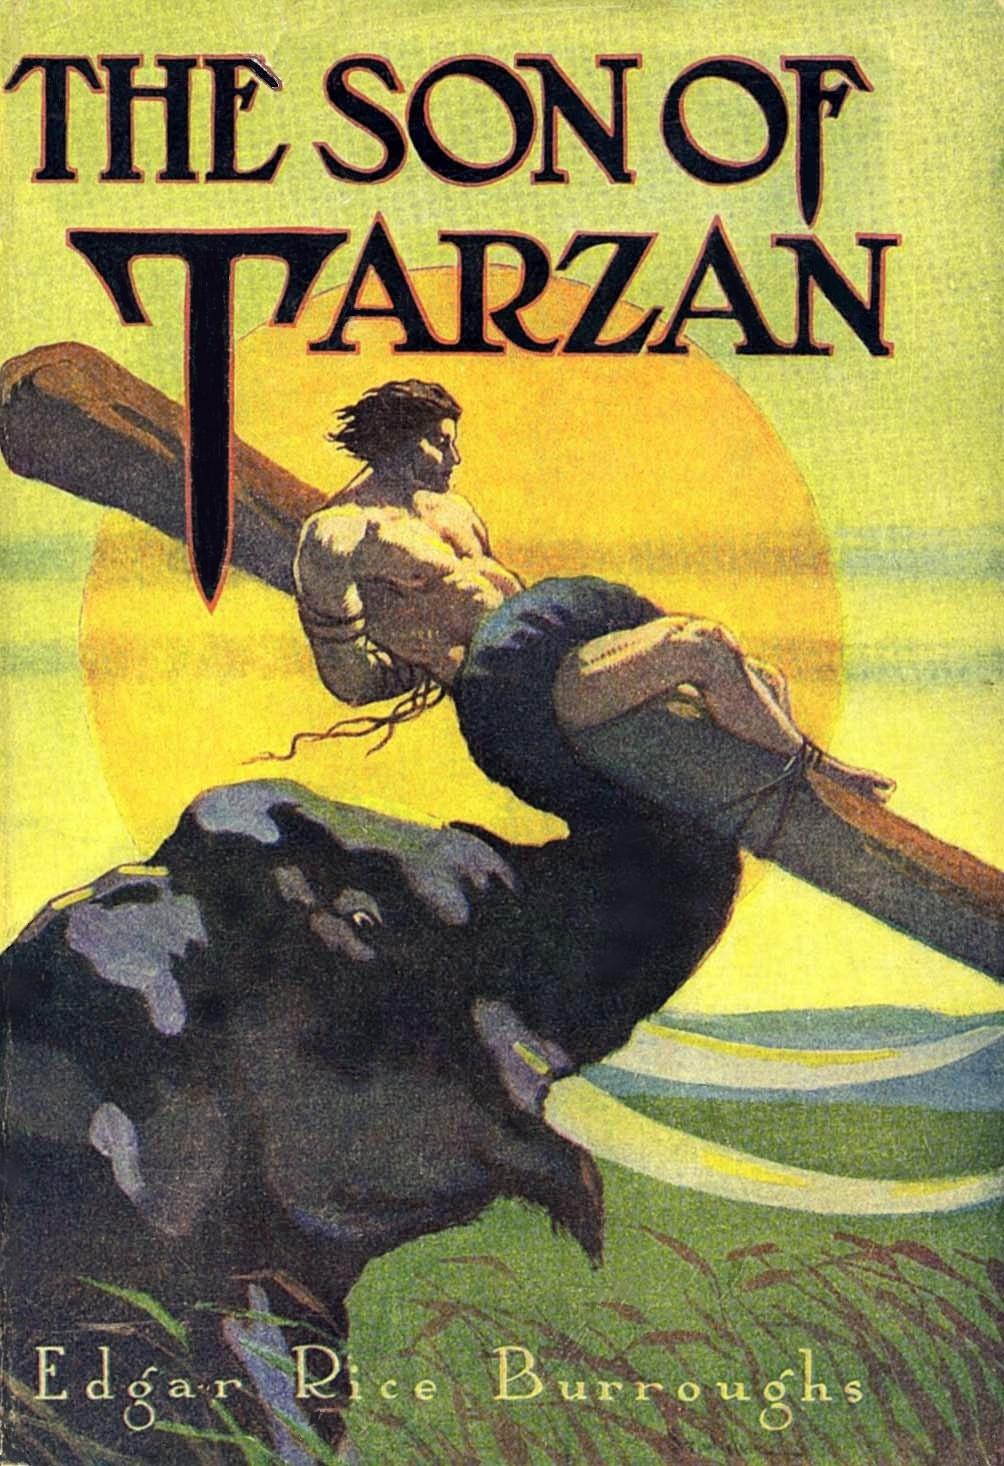 Tantor generic name for elephants in Mangani in the Tarzan novels of Edgar Rice Burroughs